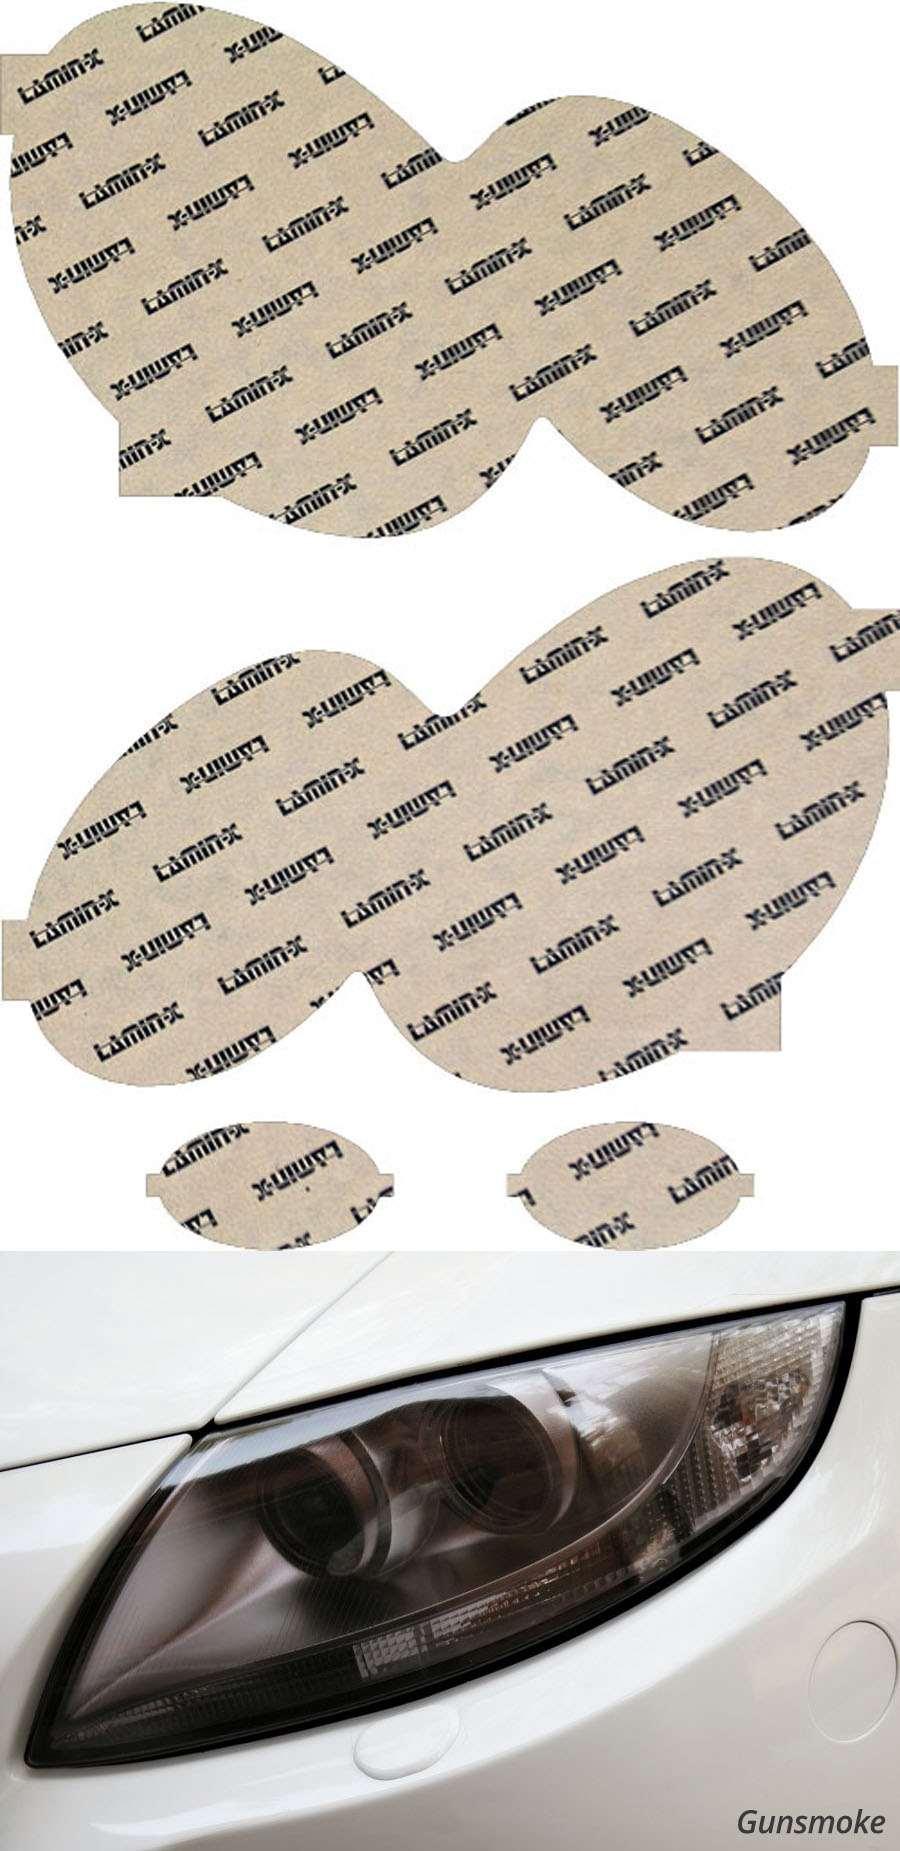 Mercedes SL-Class 07-08 Gunsmoke Headlight Covers Lamin-X MB021G